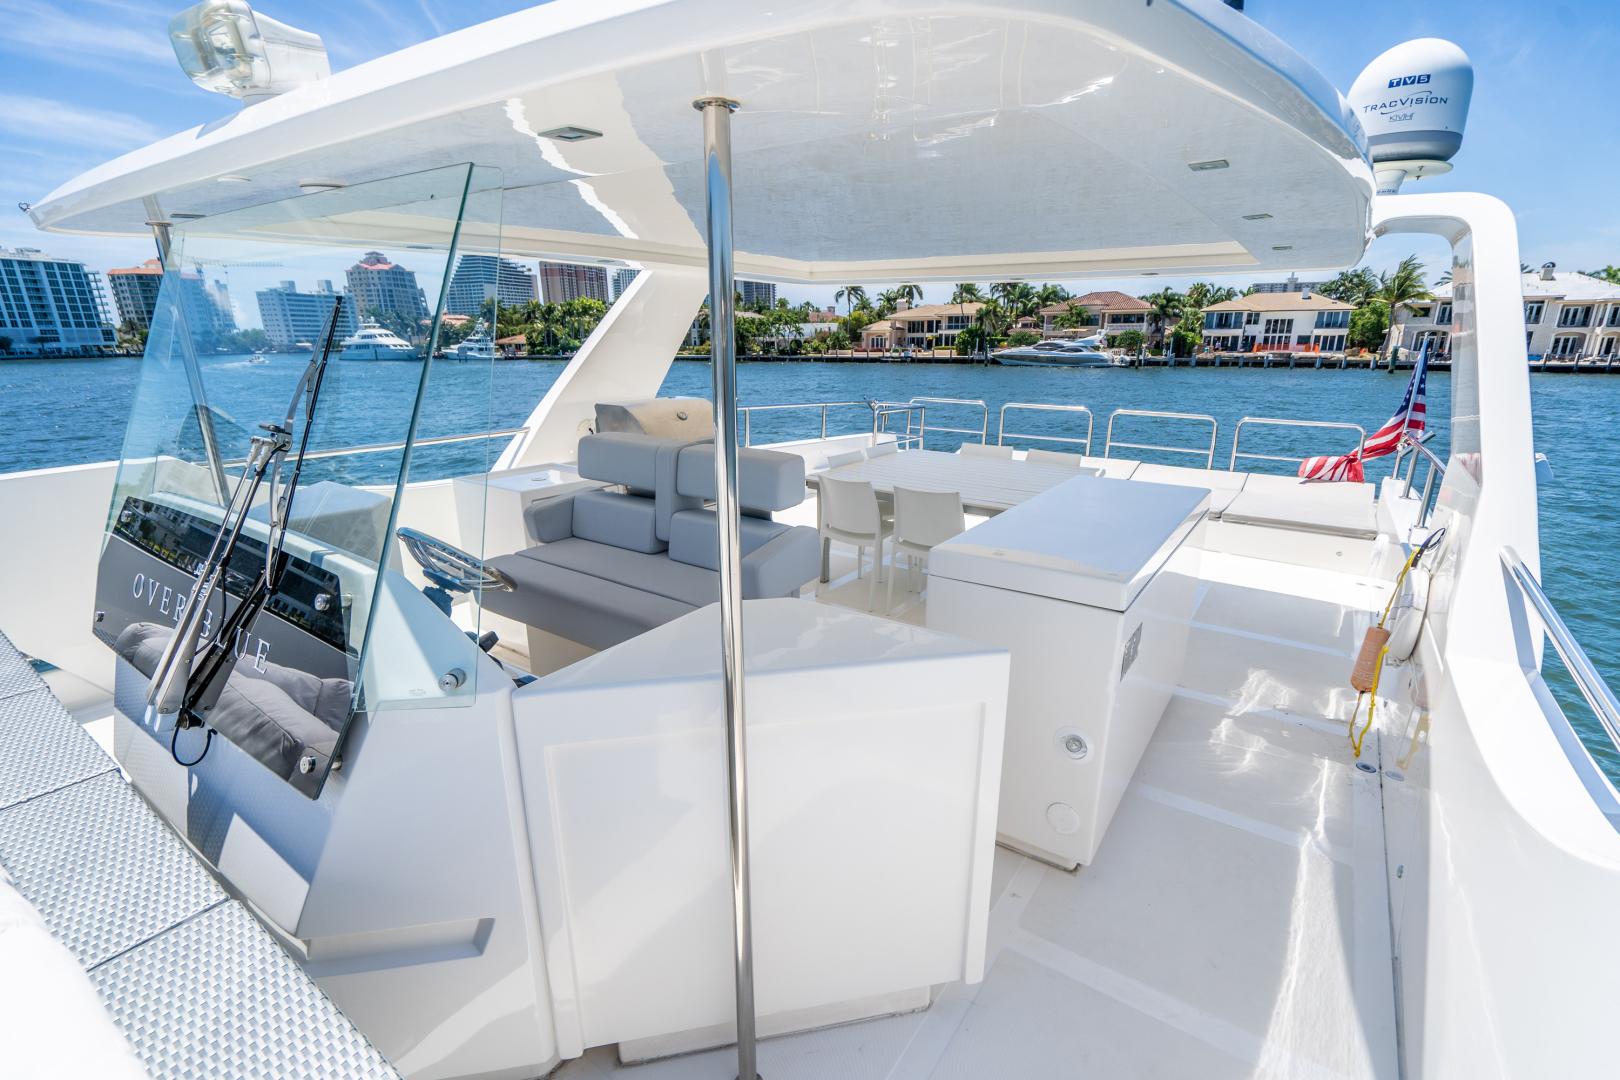 Overblue-58 Power Catamaran 2017-Techuila Ft. Lauderdale-Florida-United States-2017 Overblue 58 Powercat-1401241   Thumbnail